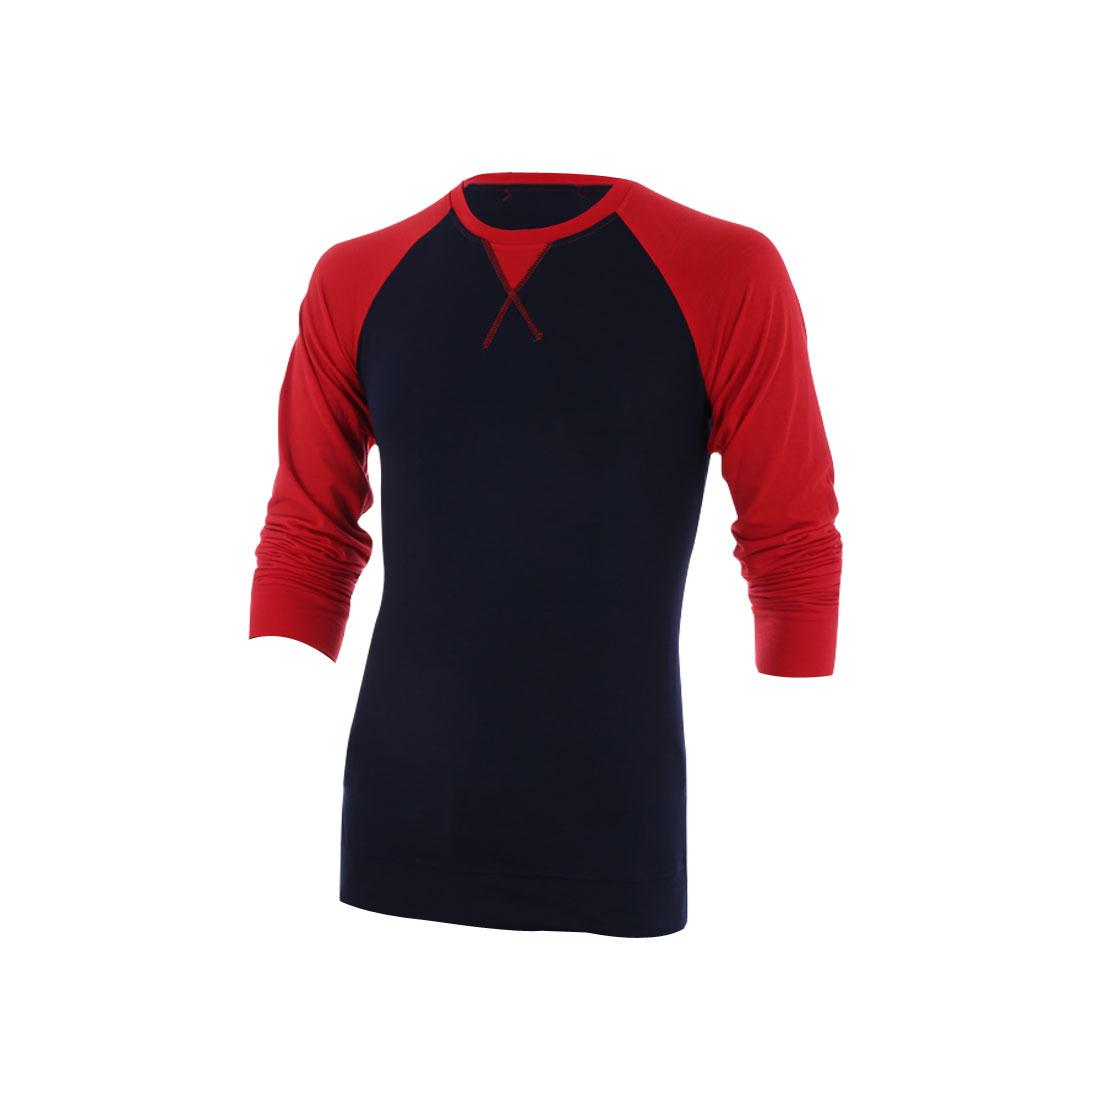 Man Chic Dark Blue Red Long Raglan Sleeve Spring Tee Shirt M